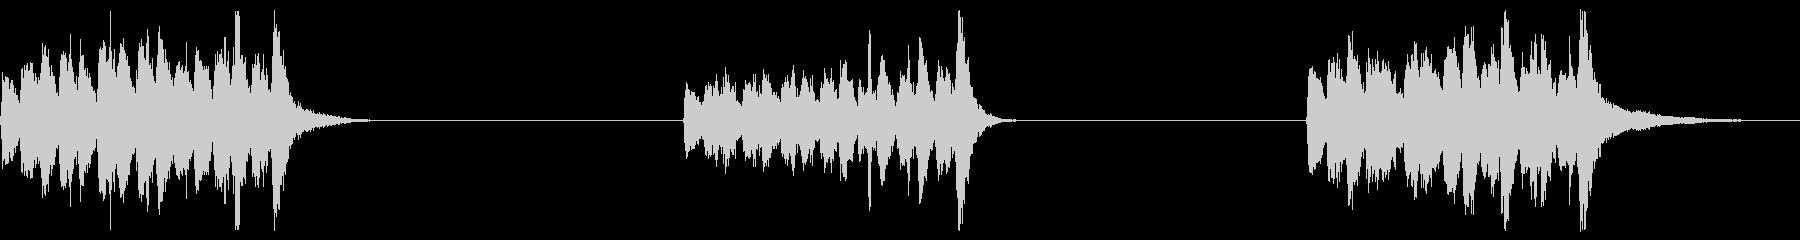 SCALE DOE、3バージョン、...の未再生の波形